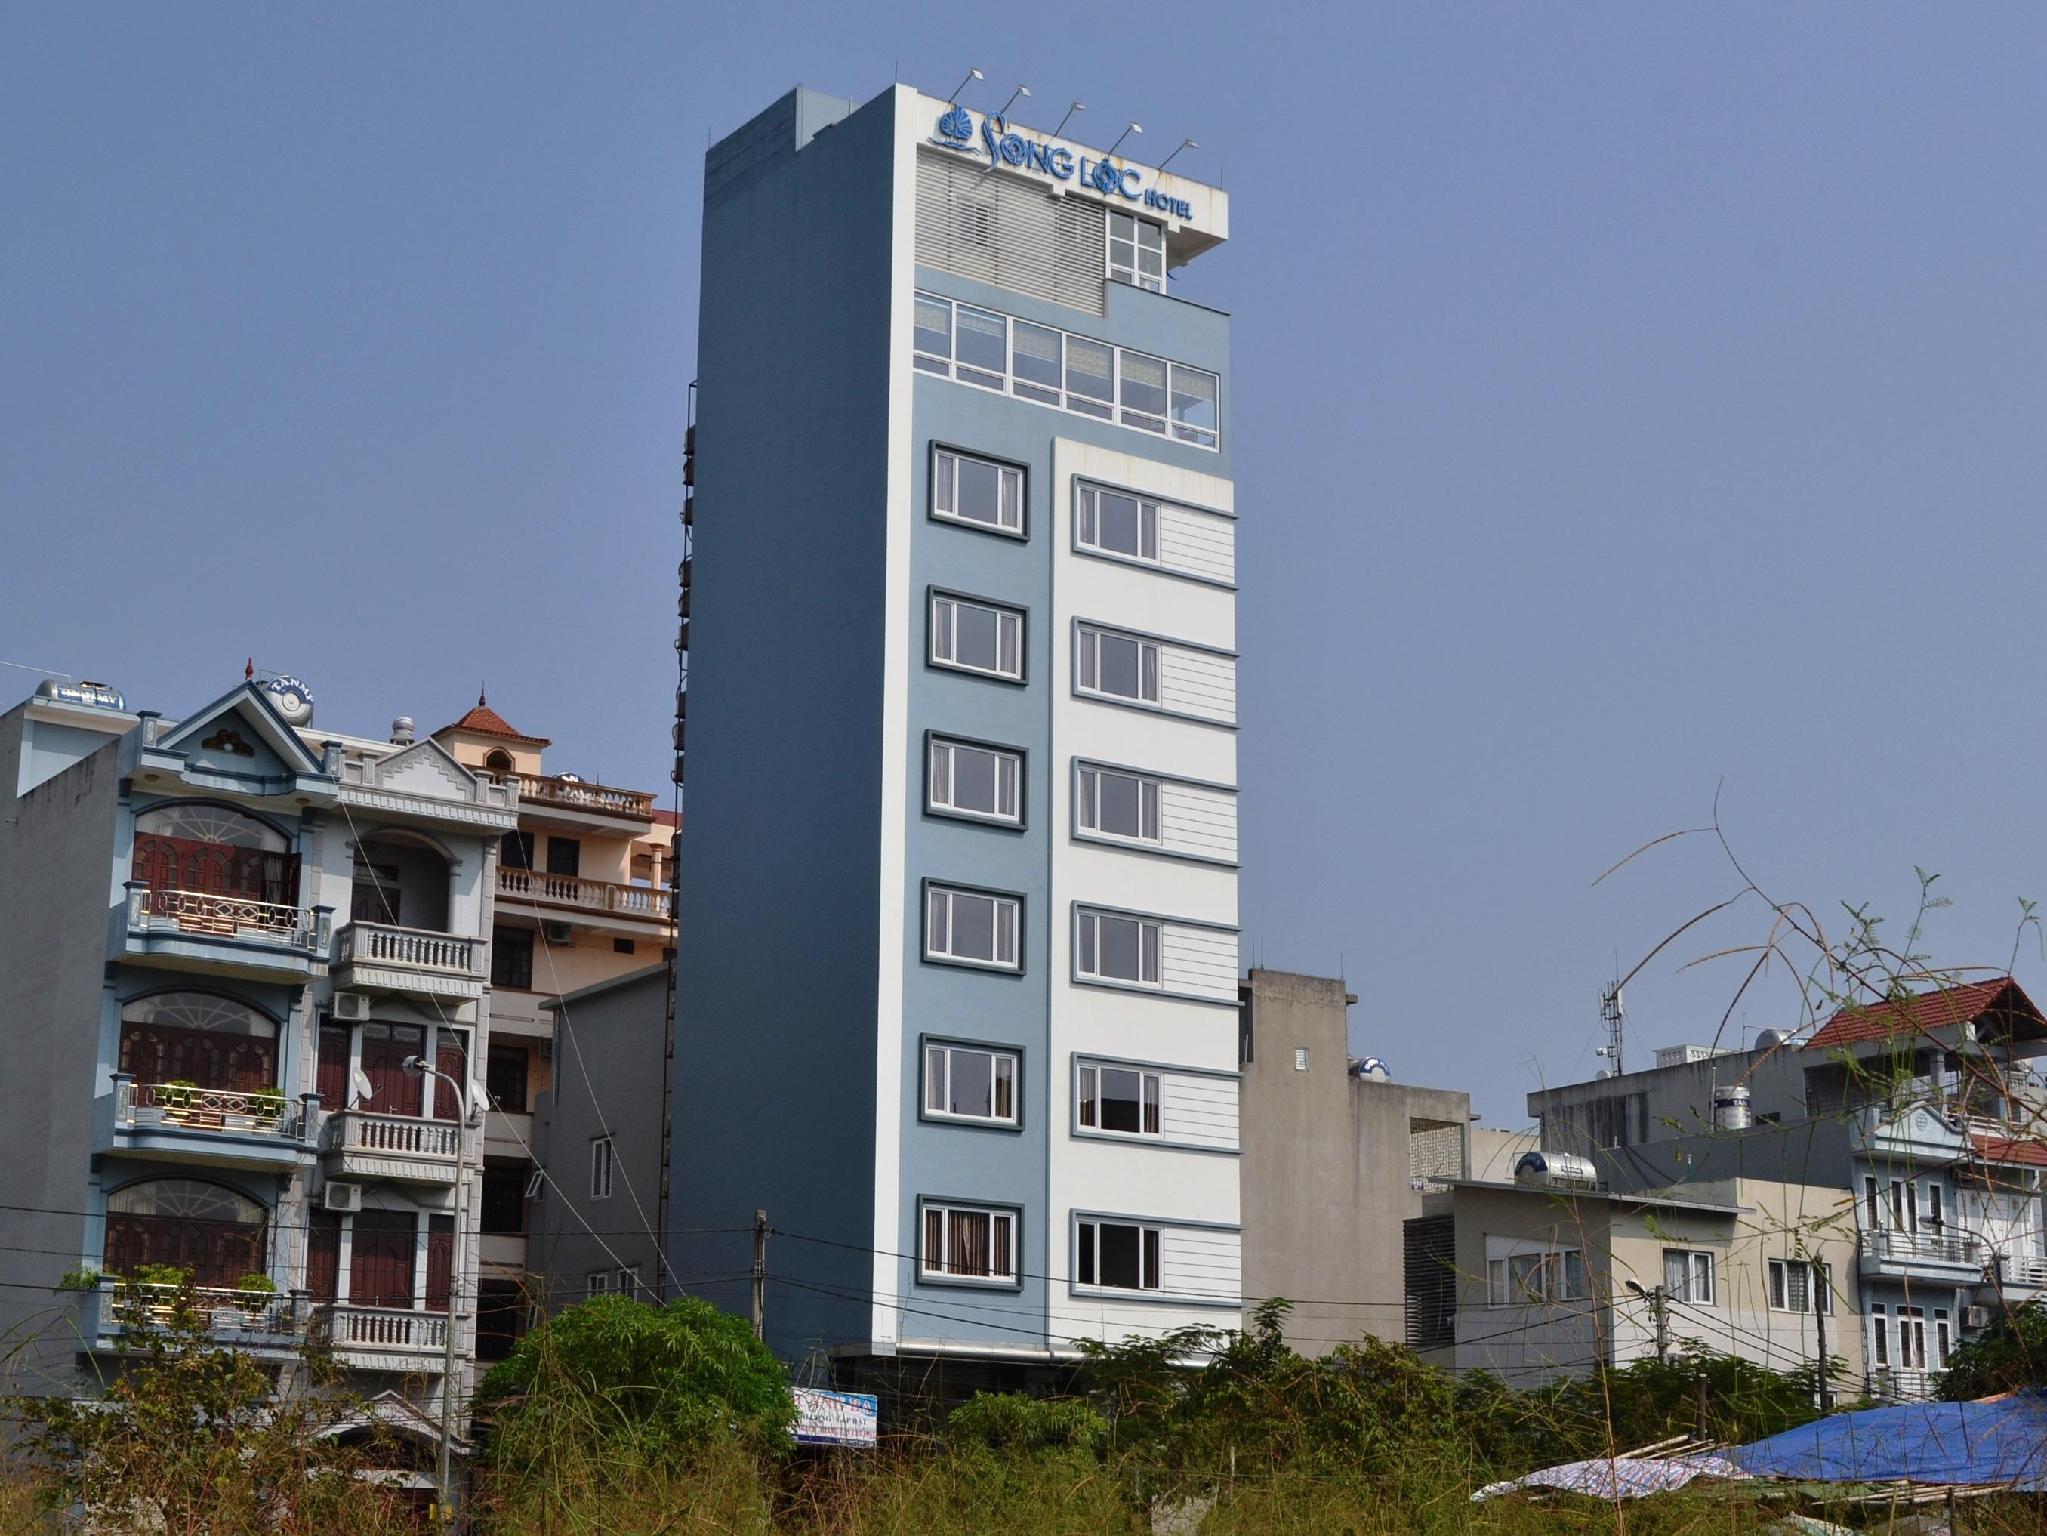 Song Loc Hotel